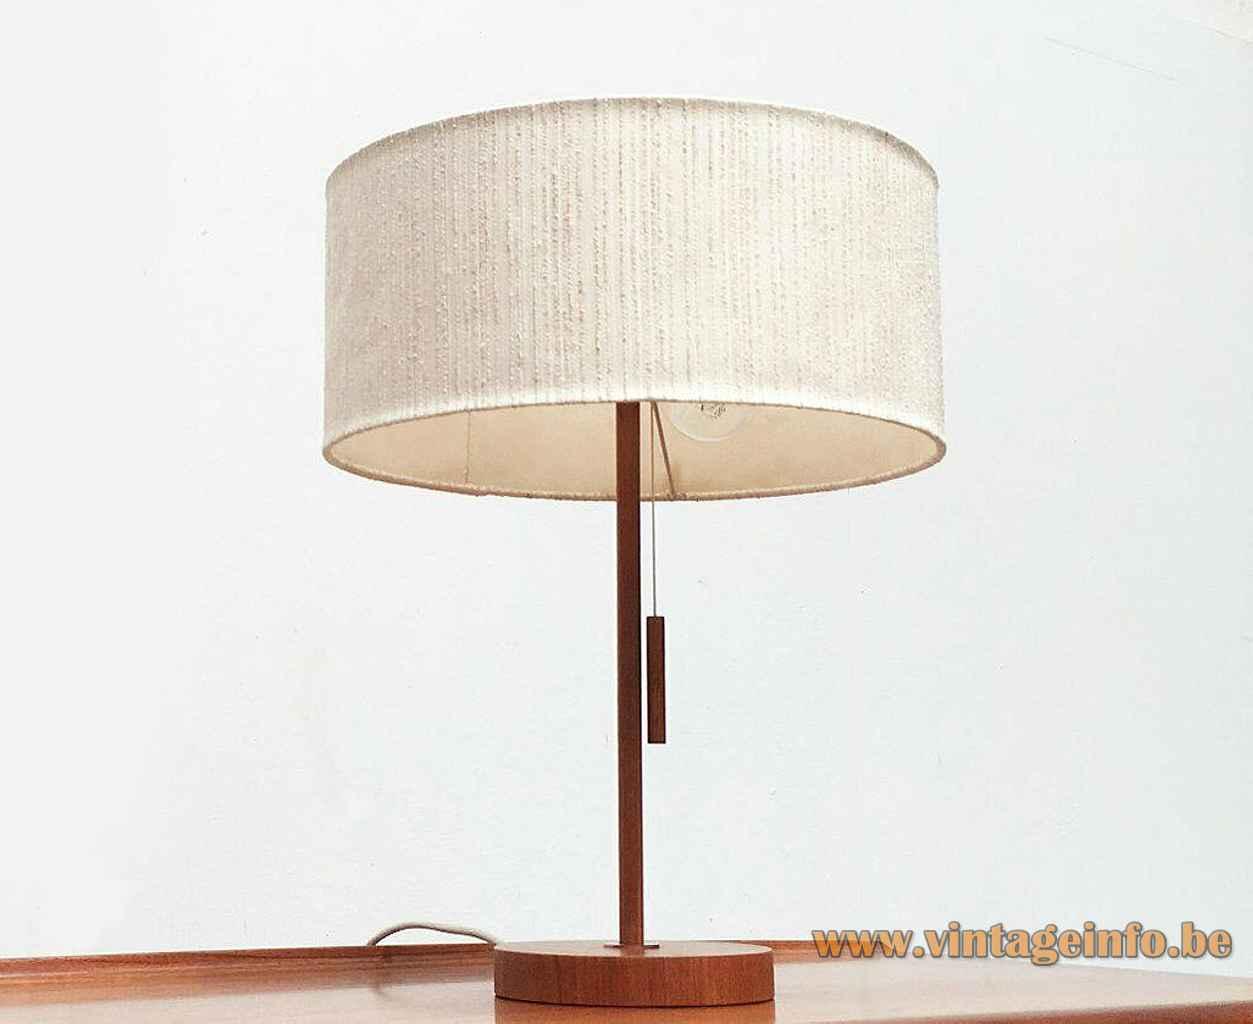 Temde teak table lamp round wood base & rod fabric lampshade 1960s Germany 2 E27 sockets